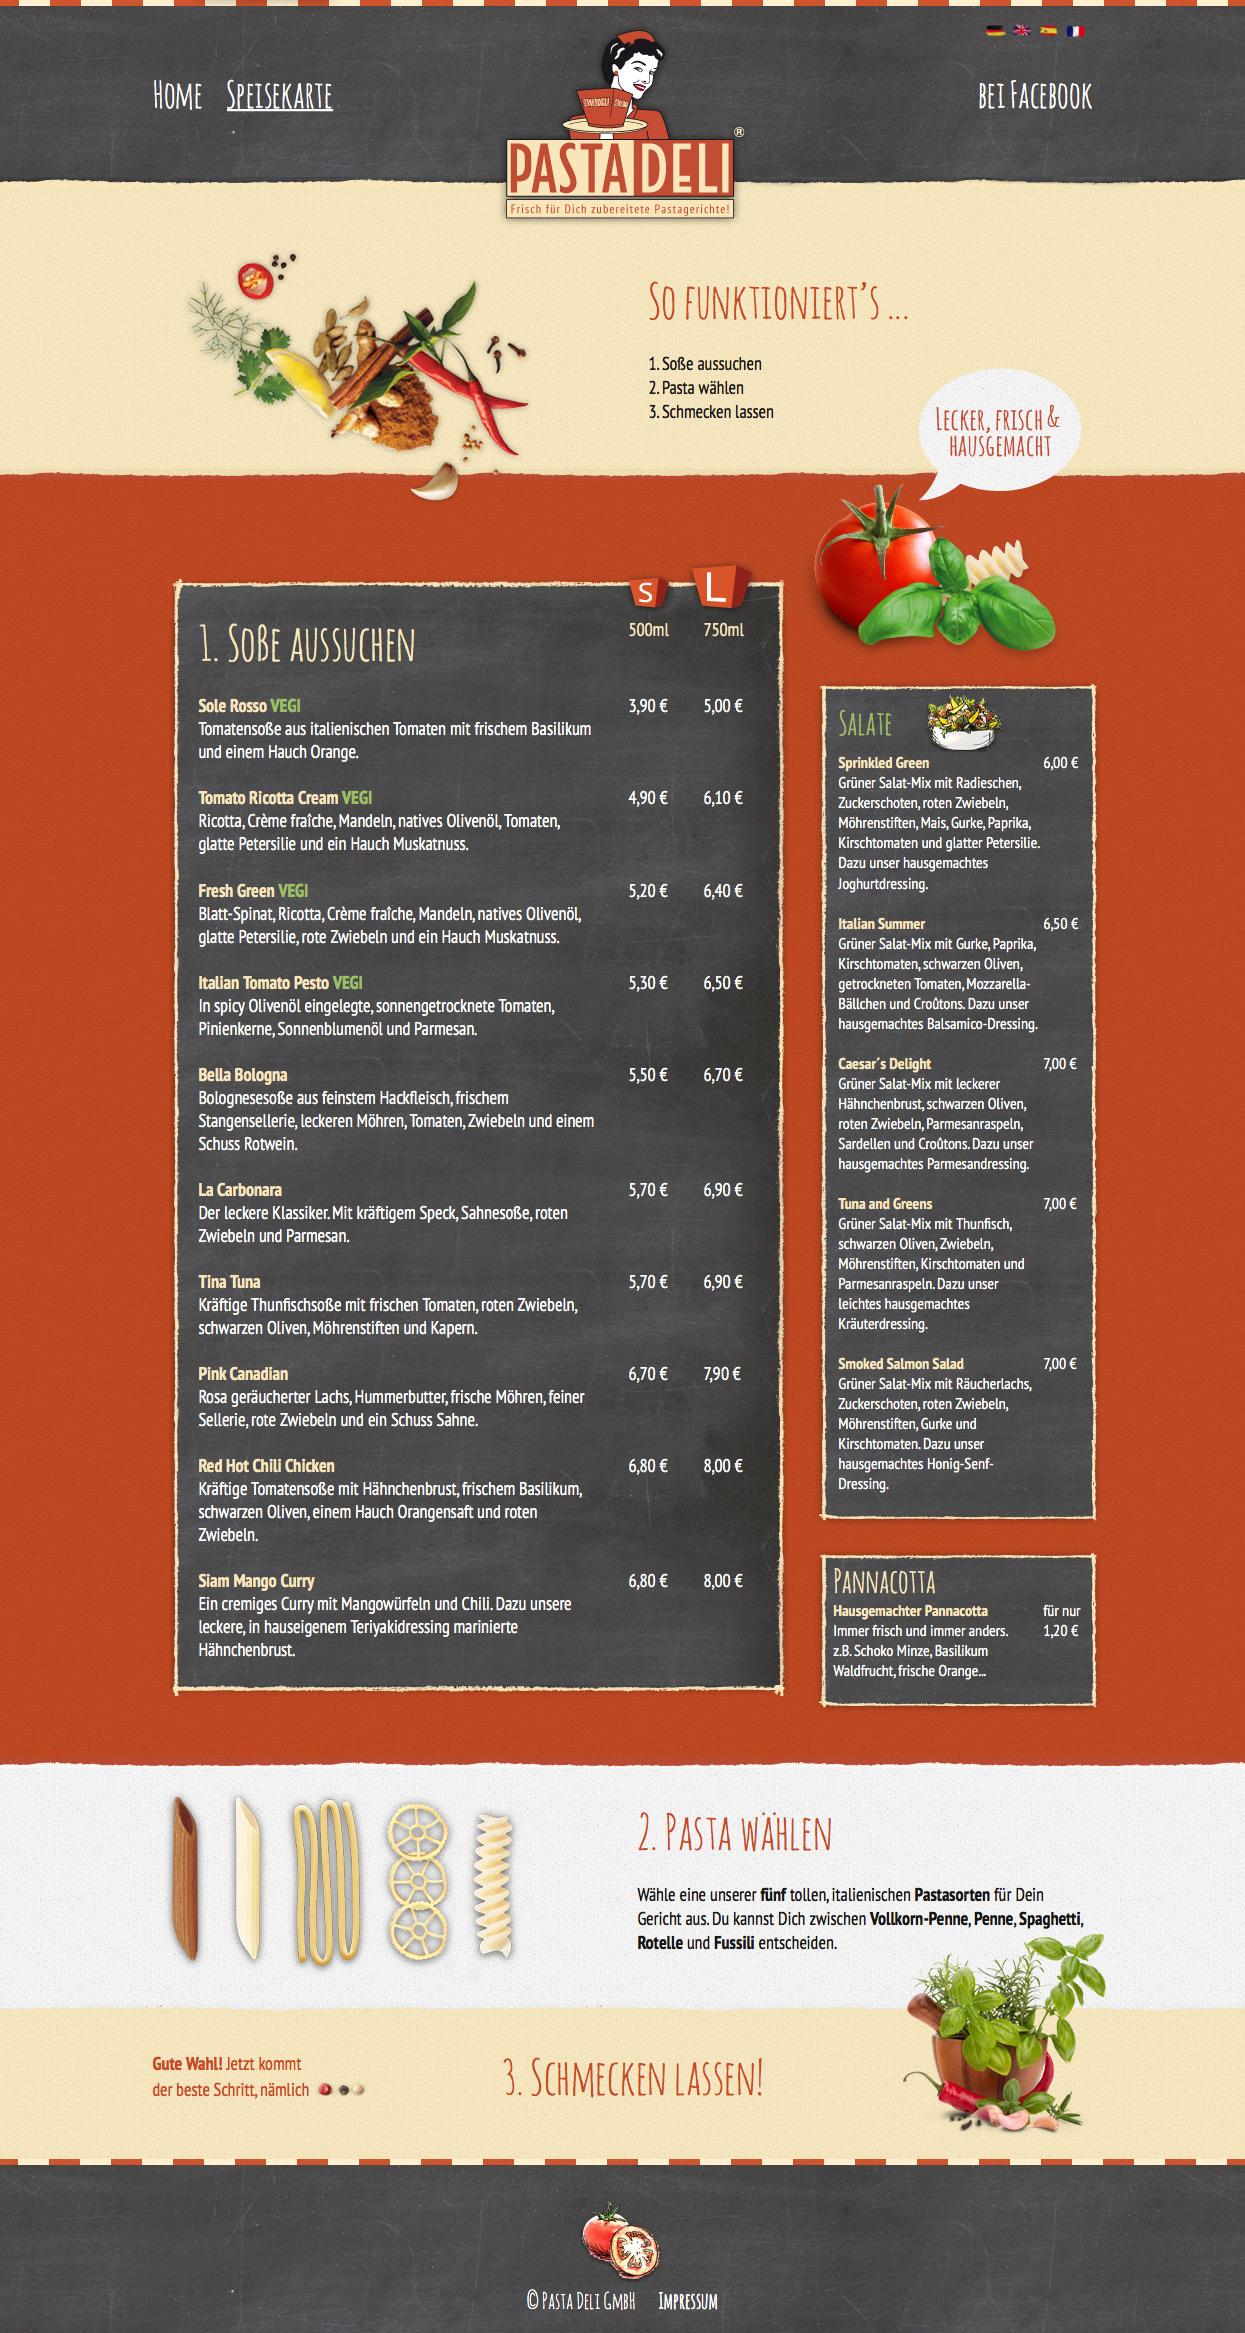 Pasta Deli Webseite